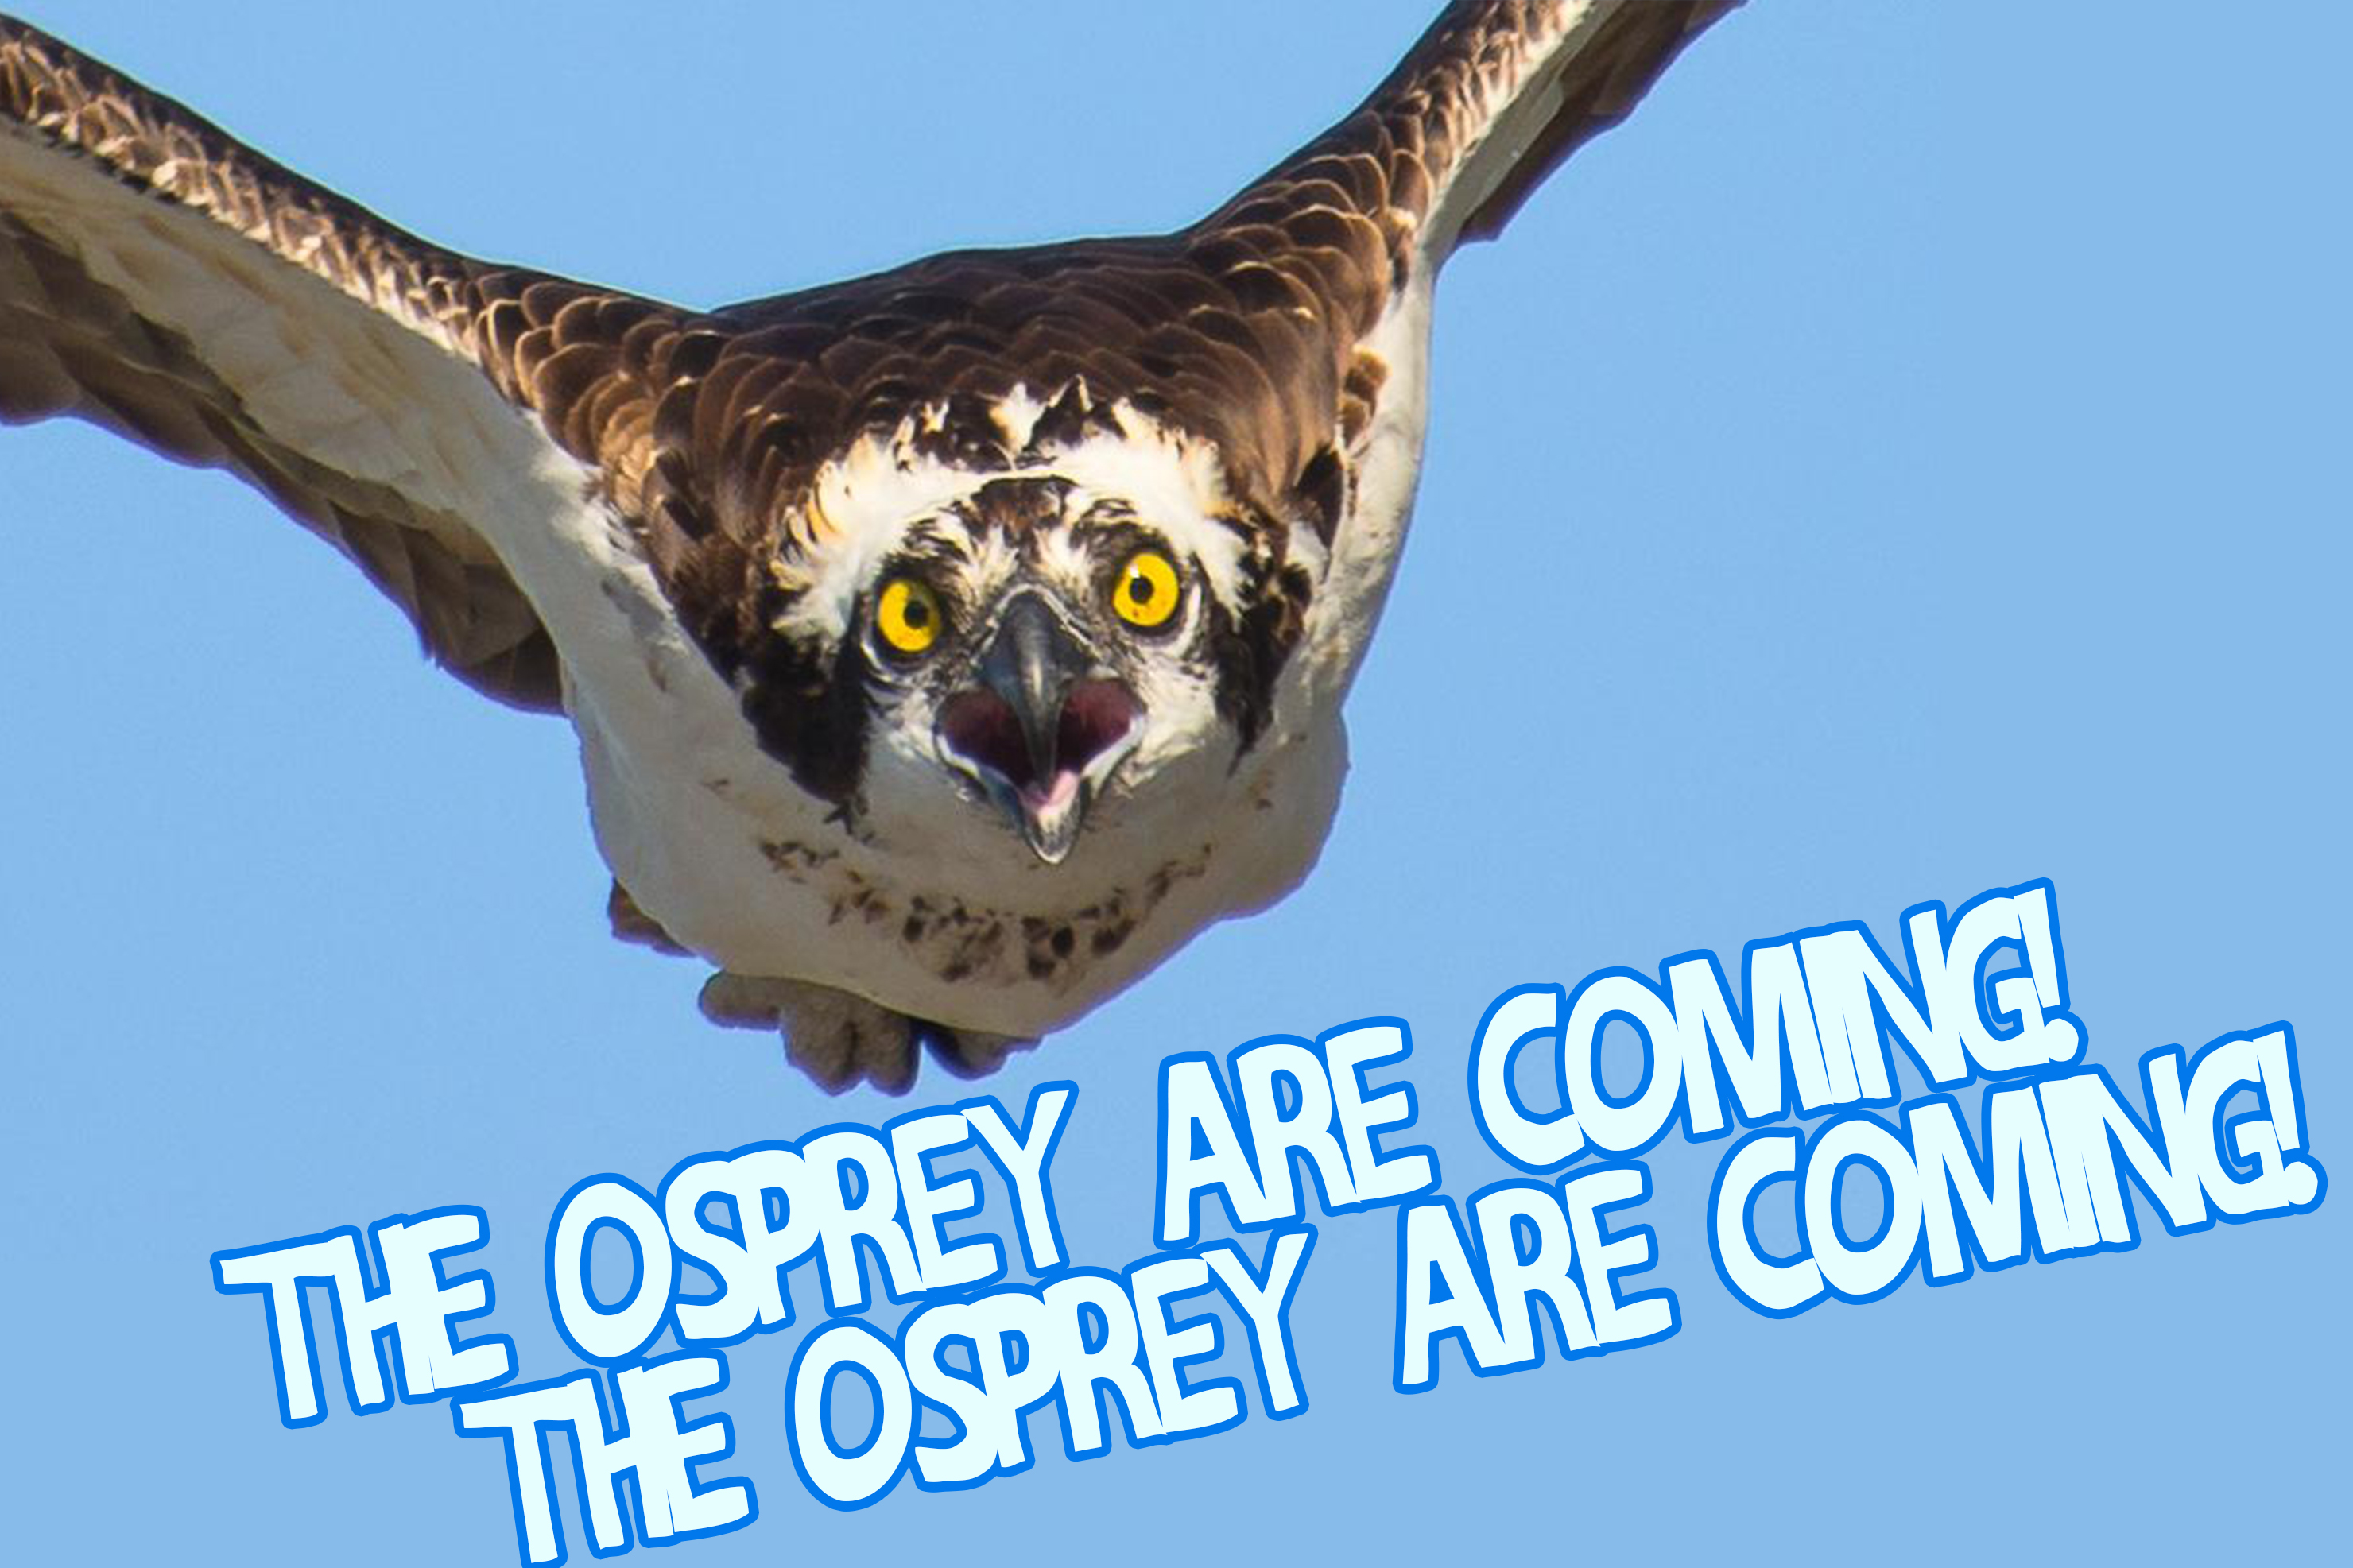 Osprey tix on sale Saturday!